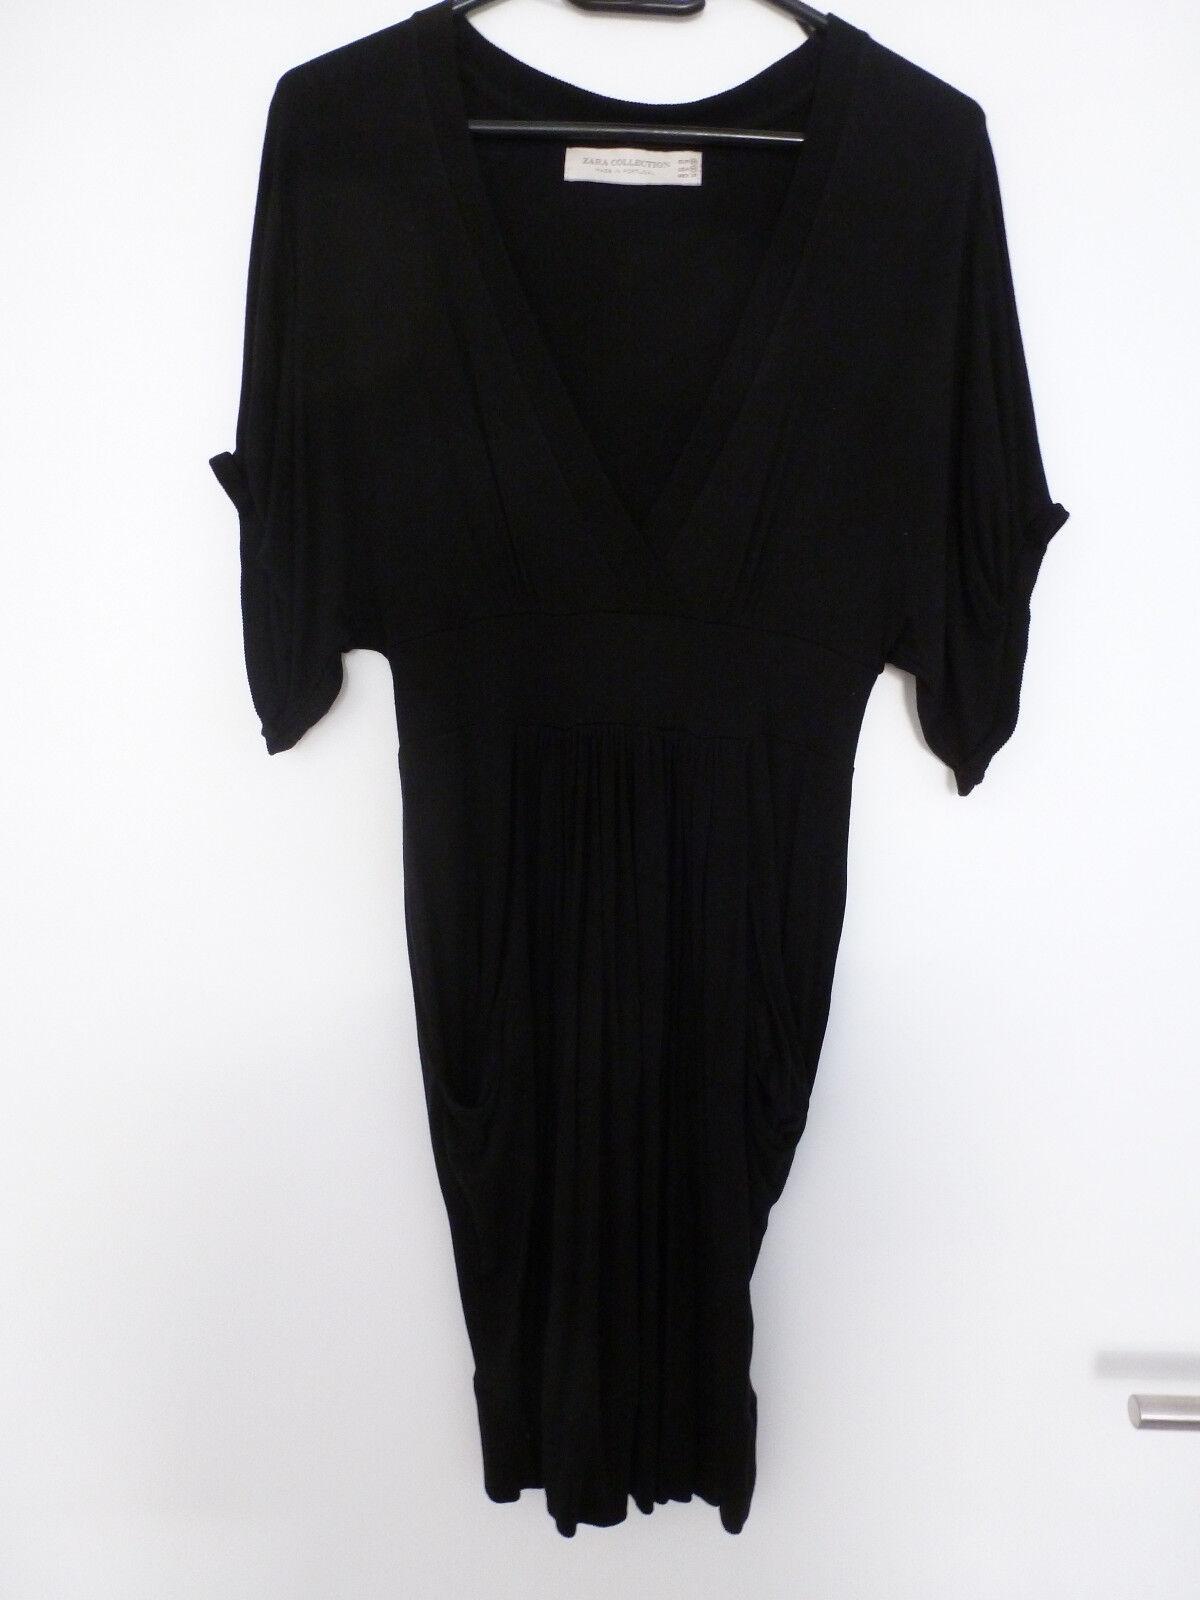 Zara Marke Kleid Abendkleid Festkleid schwarz Gr. M NEU